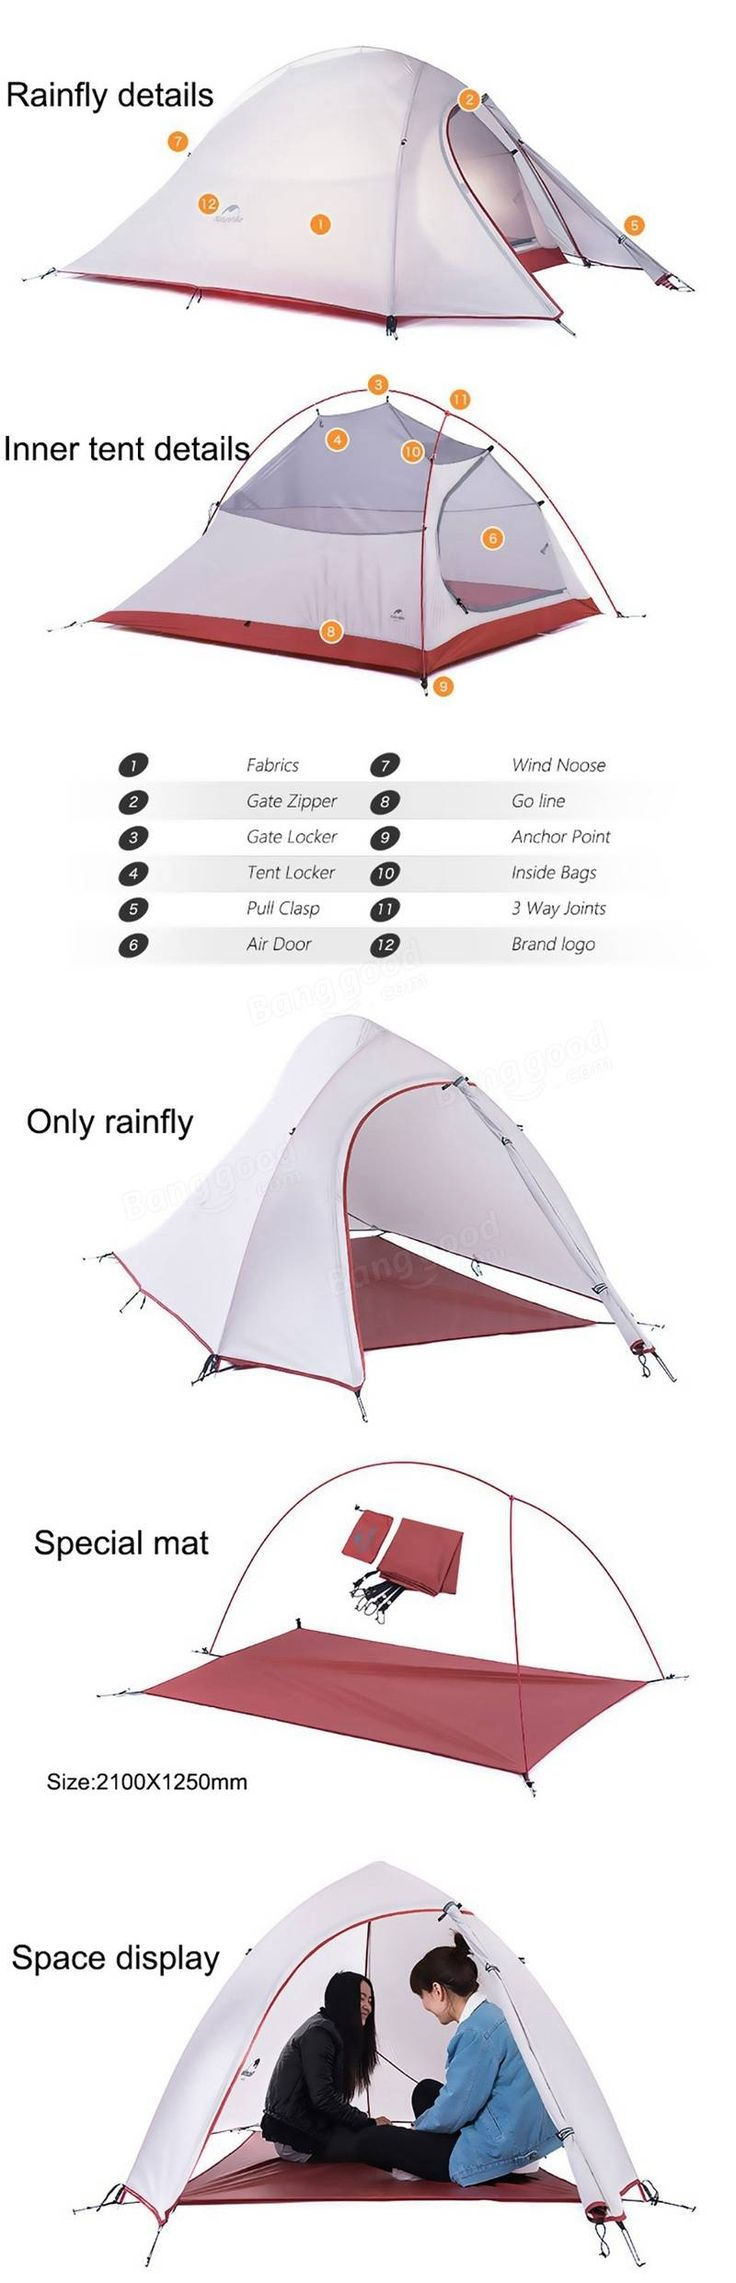 Naturehike Camping 2 Persons Tent Sunshade Double Layer Waterproof Anti-UV Sun Shelter Travel Hiking